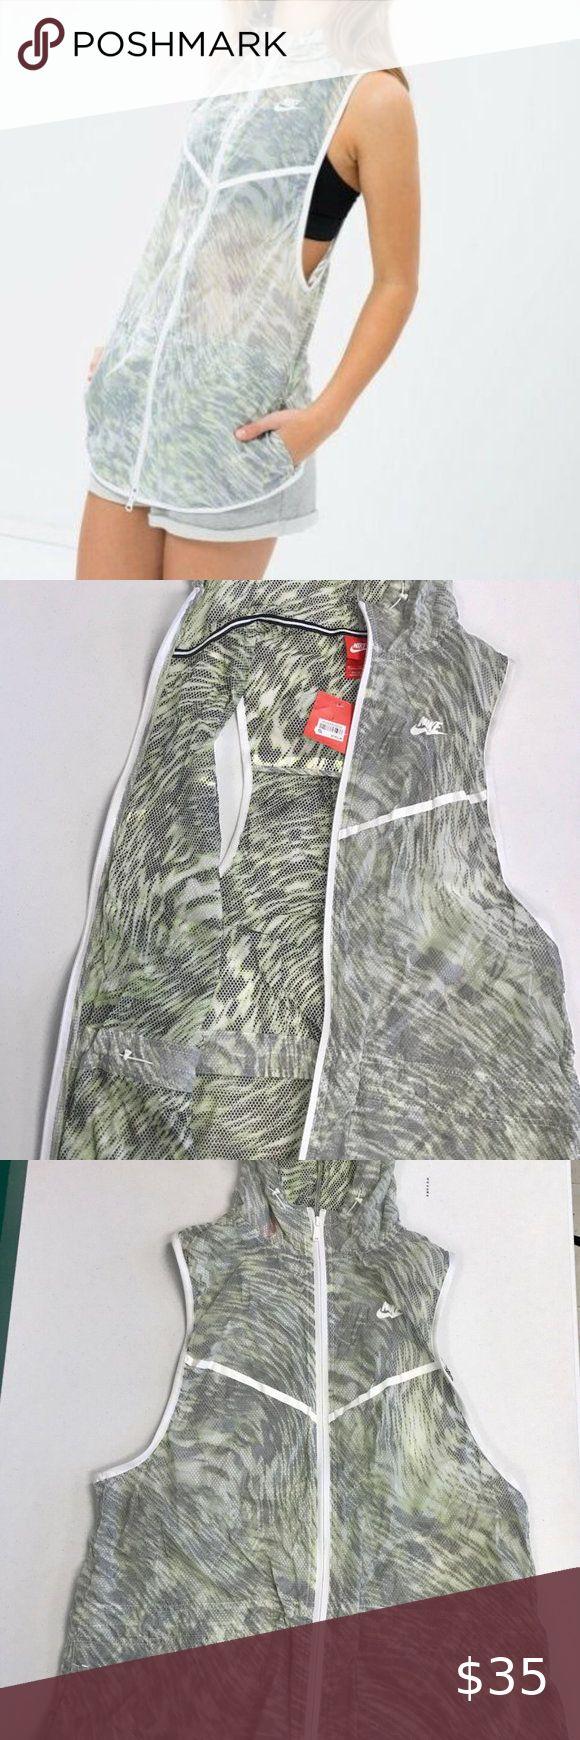 Nike Women's Tech Hyperfuse Vest Volt / White XL in 2020